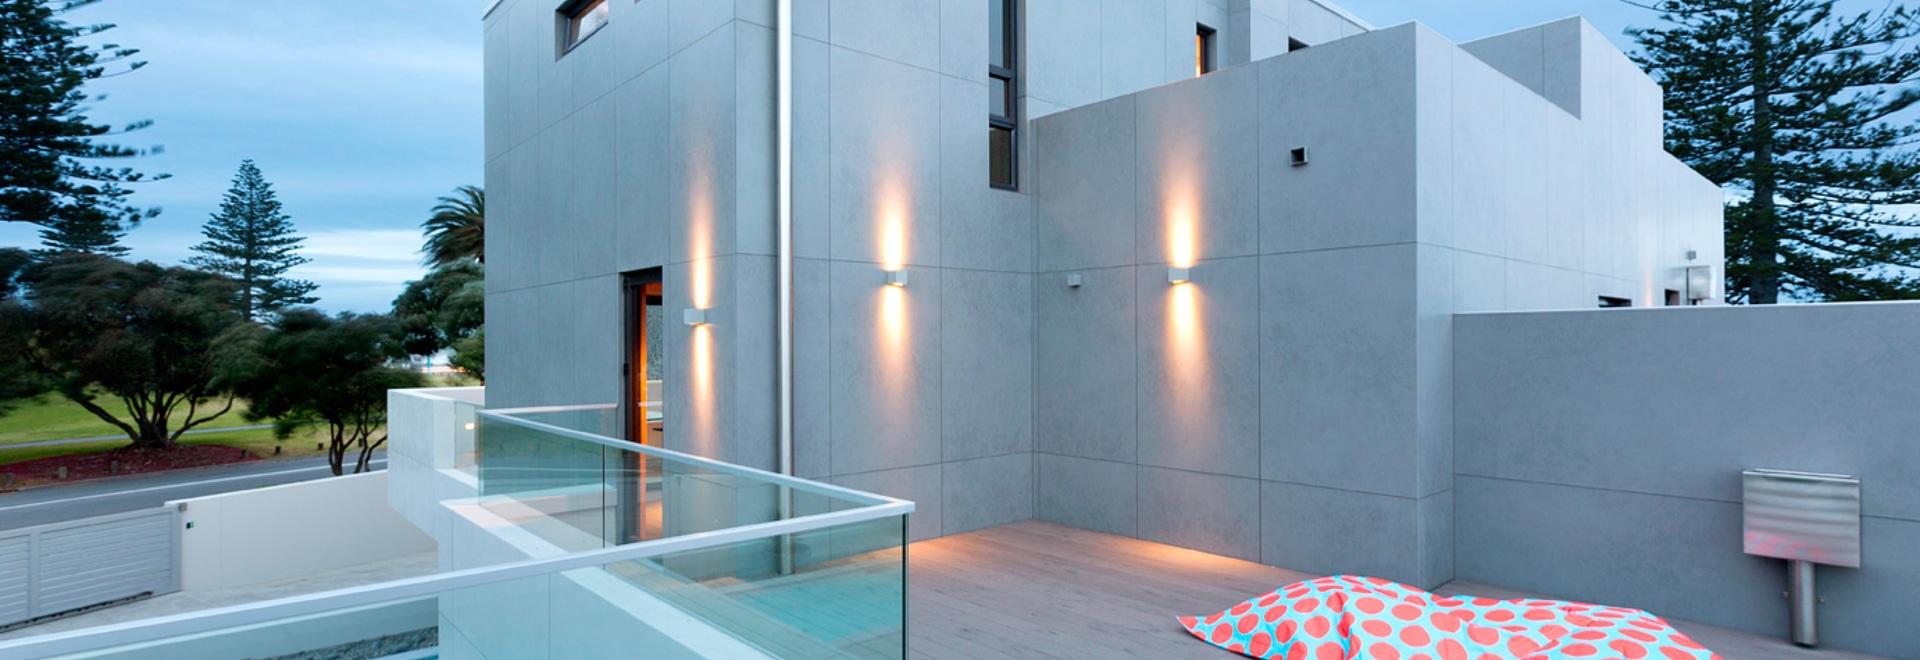 casa privada de tauranga nueva zelanda